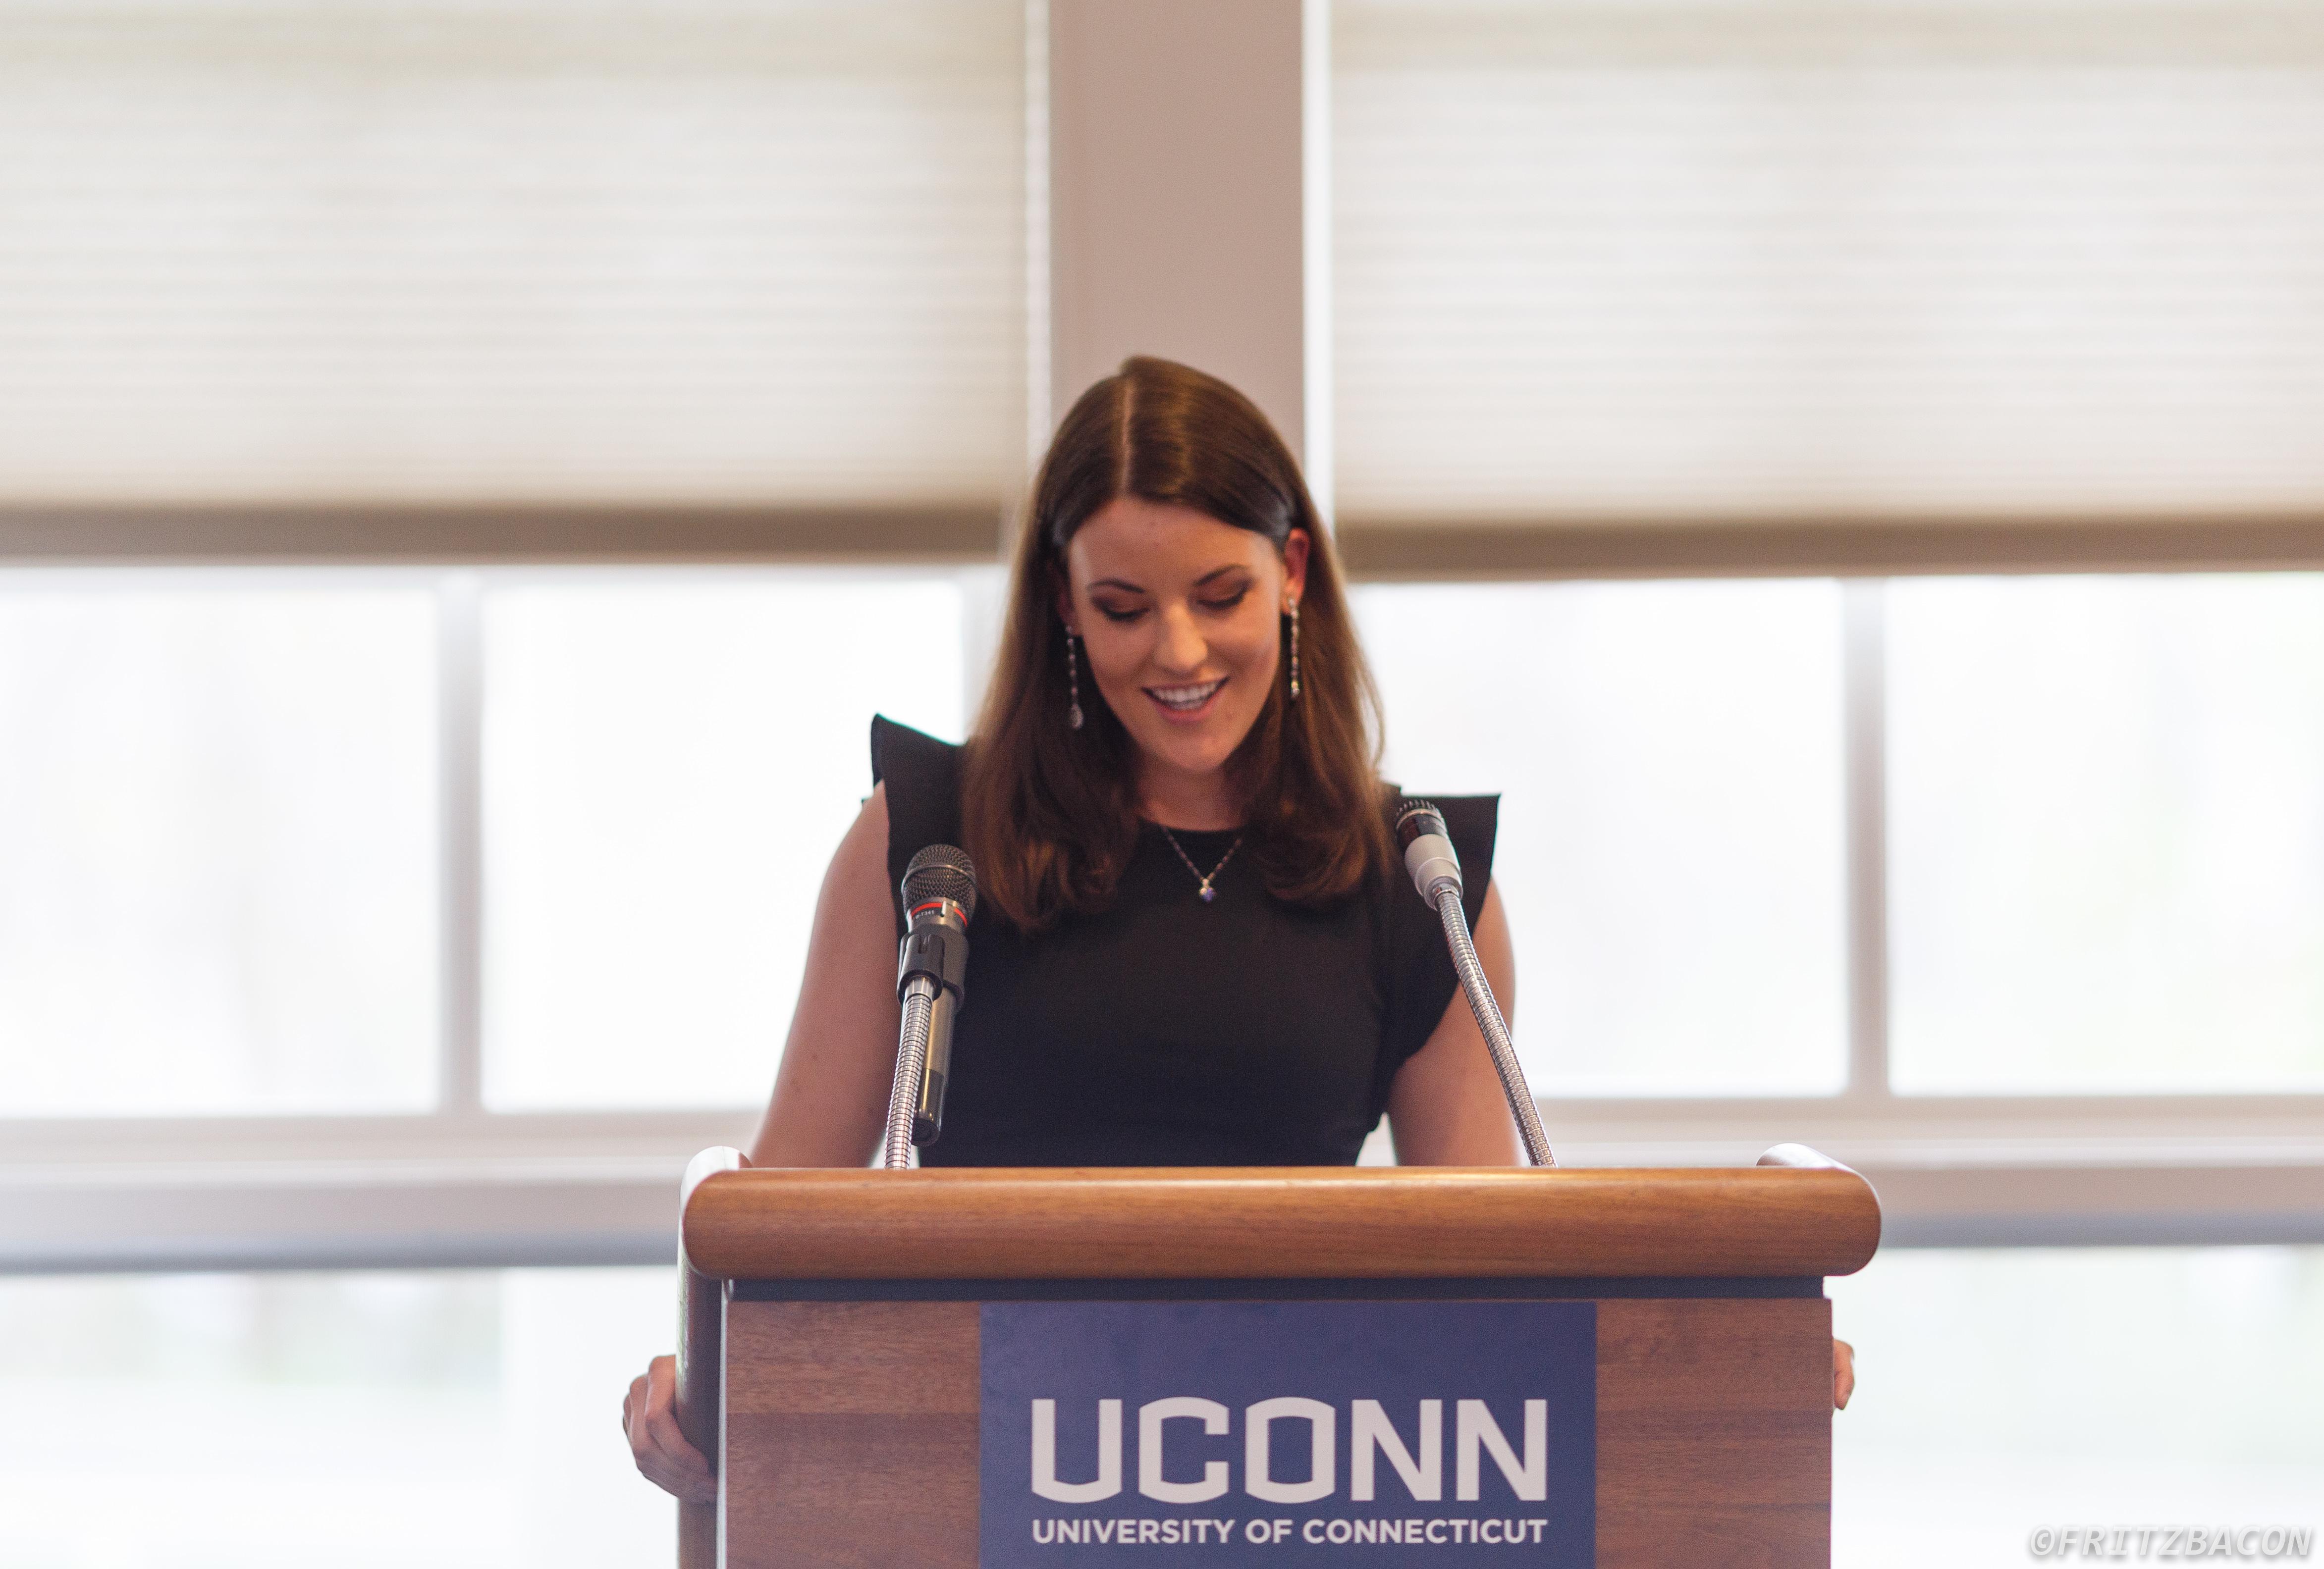 Communication graduate, Brooke Hirsheimer